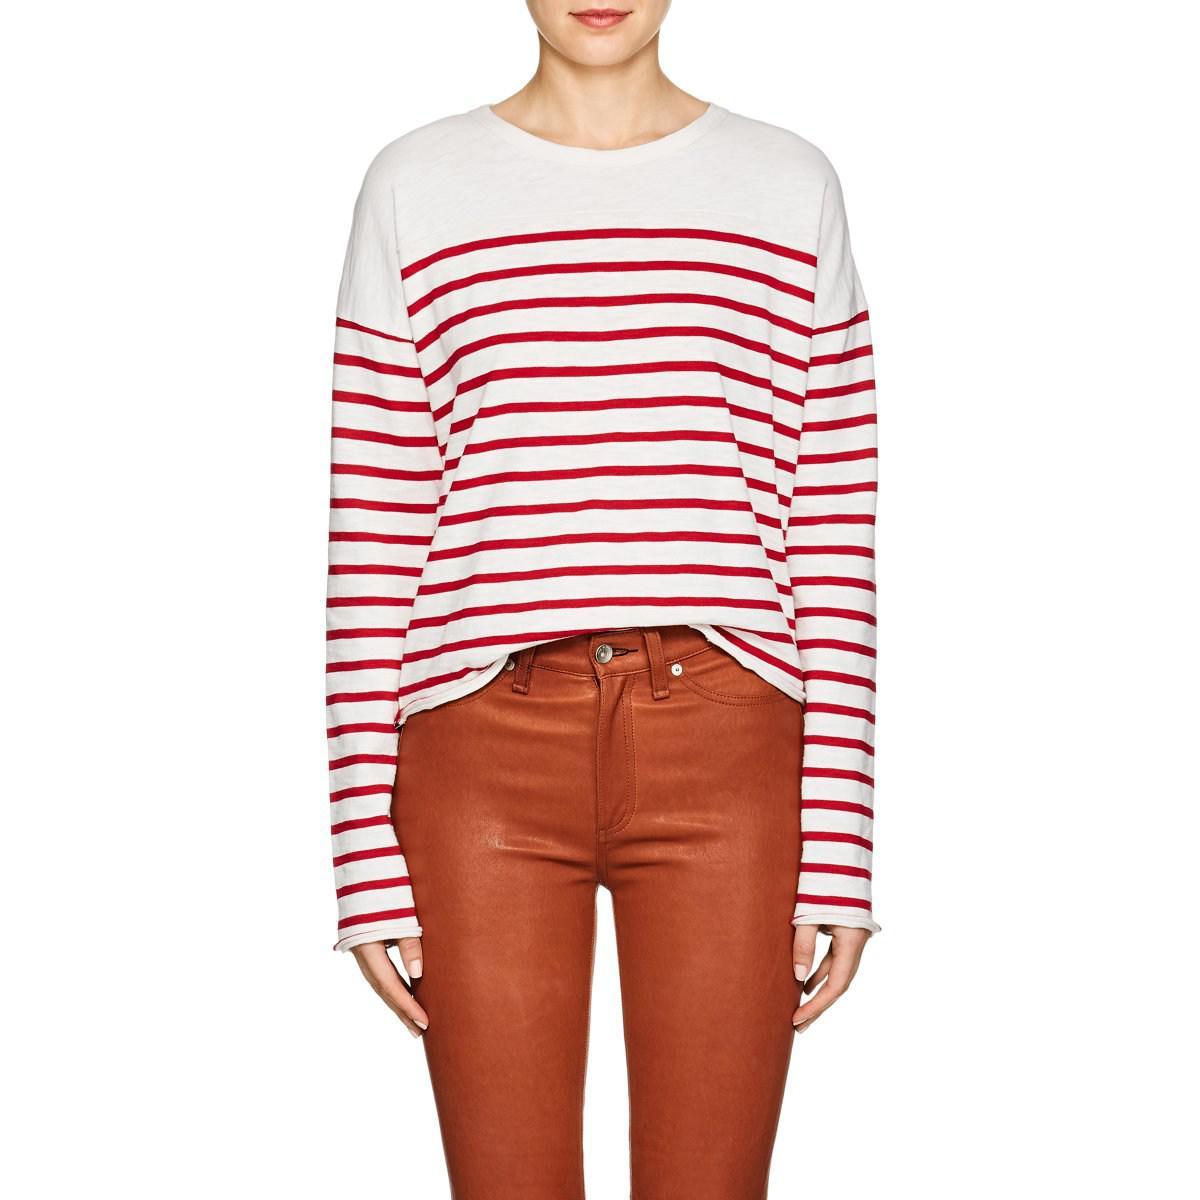 97a1cde5bb Lyst - Rag & Bone Halsey Striped Cotton T-shirt in White